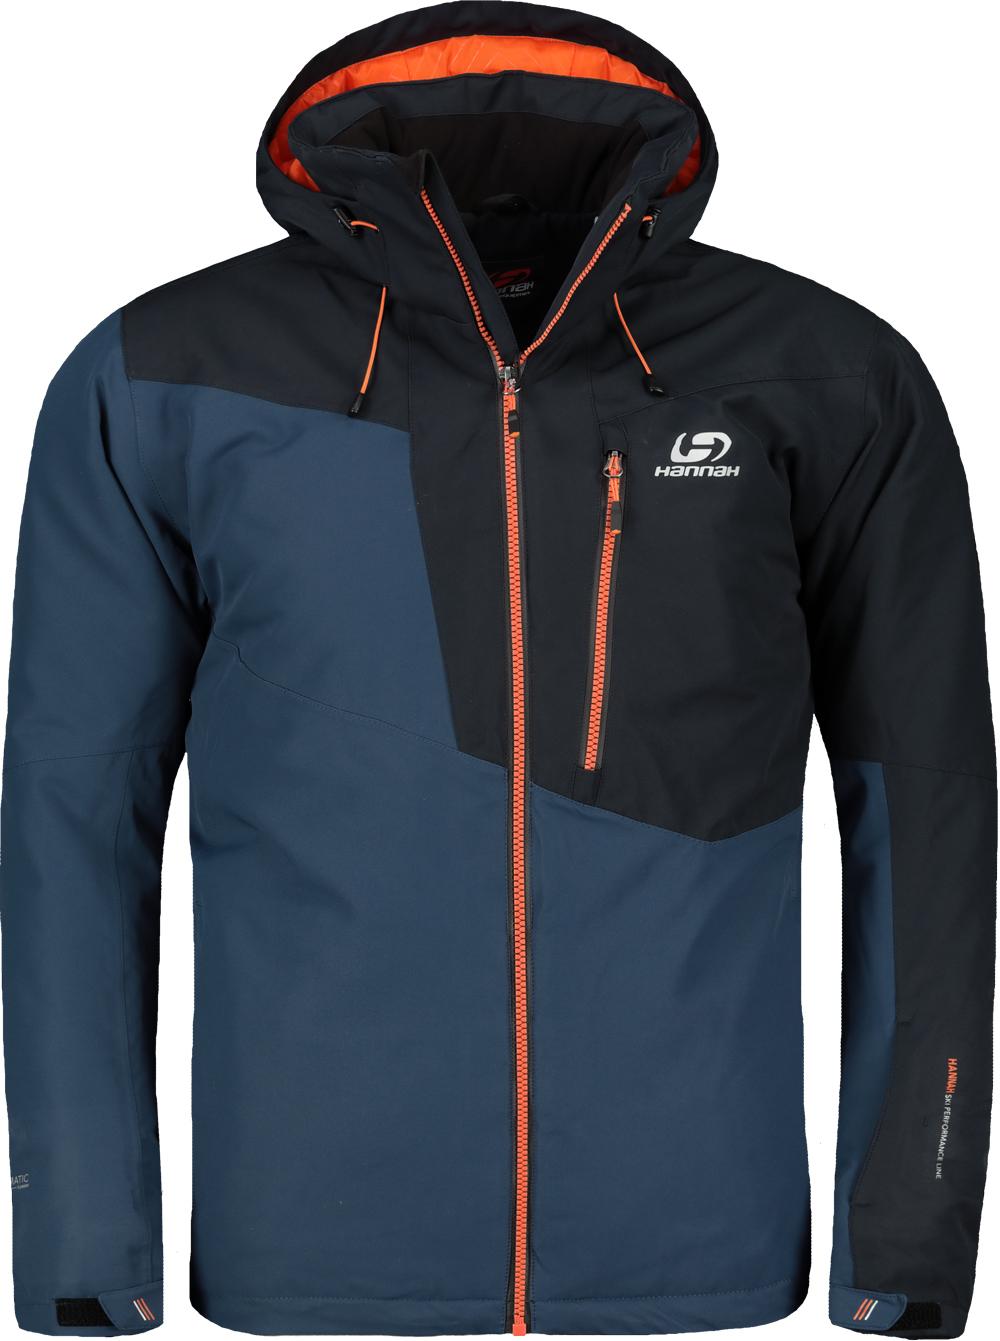 Ski jacket men's HANNAH Camber